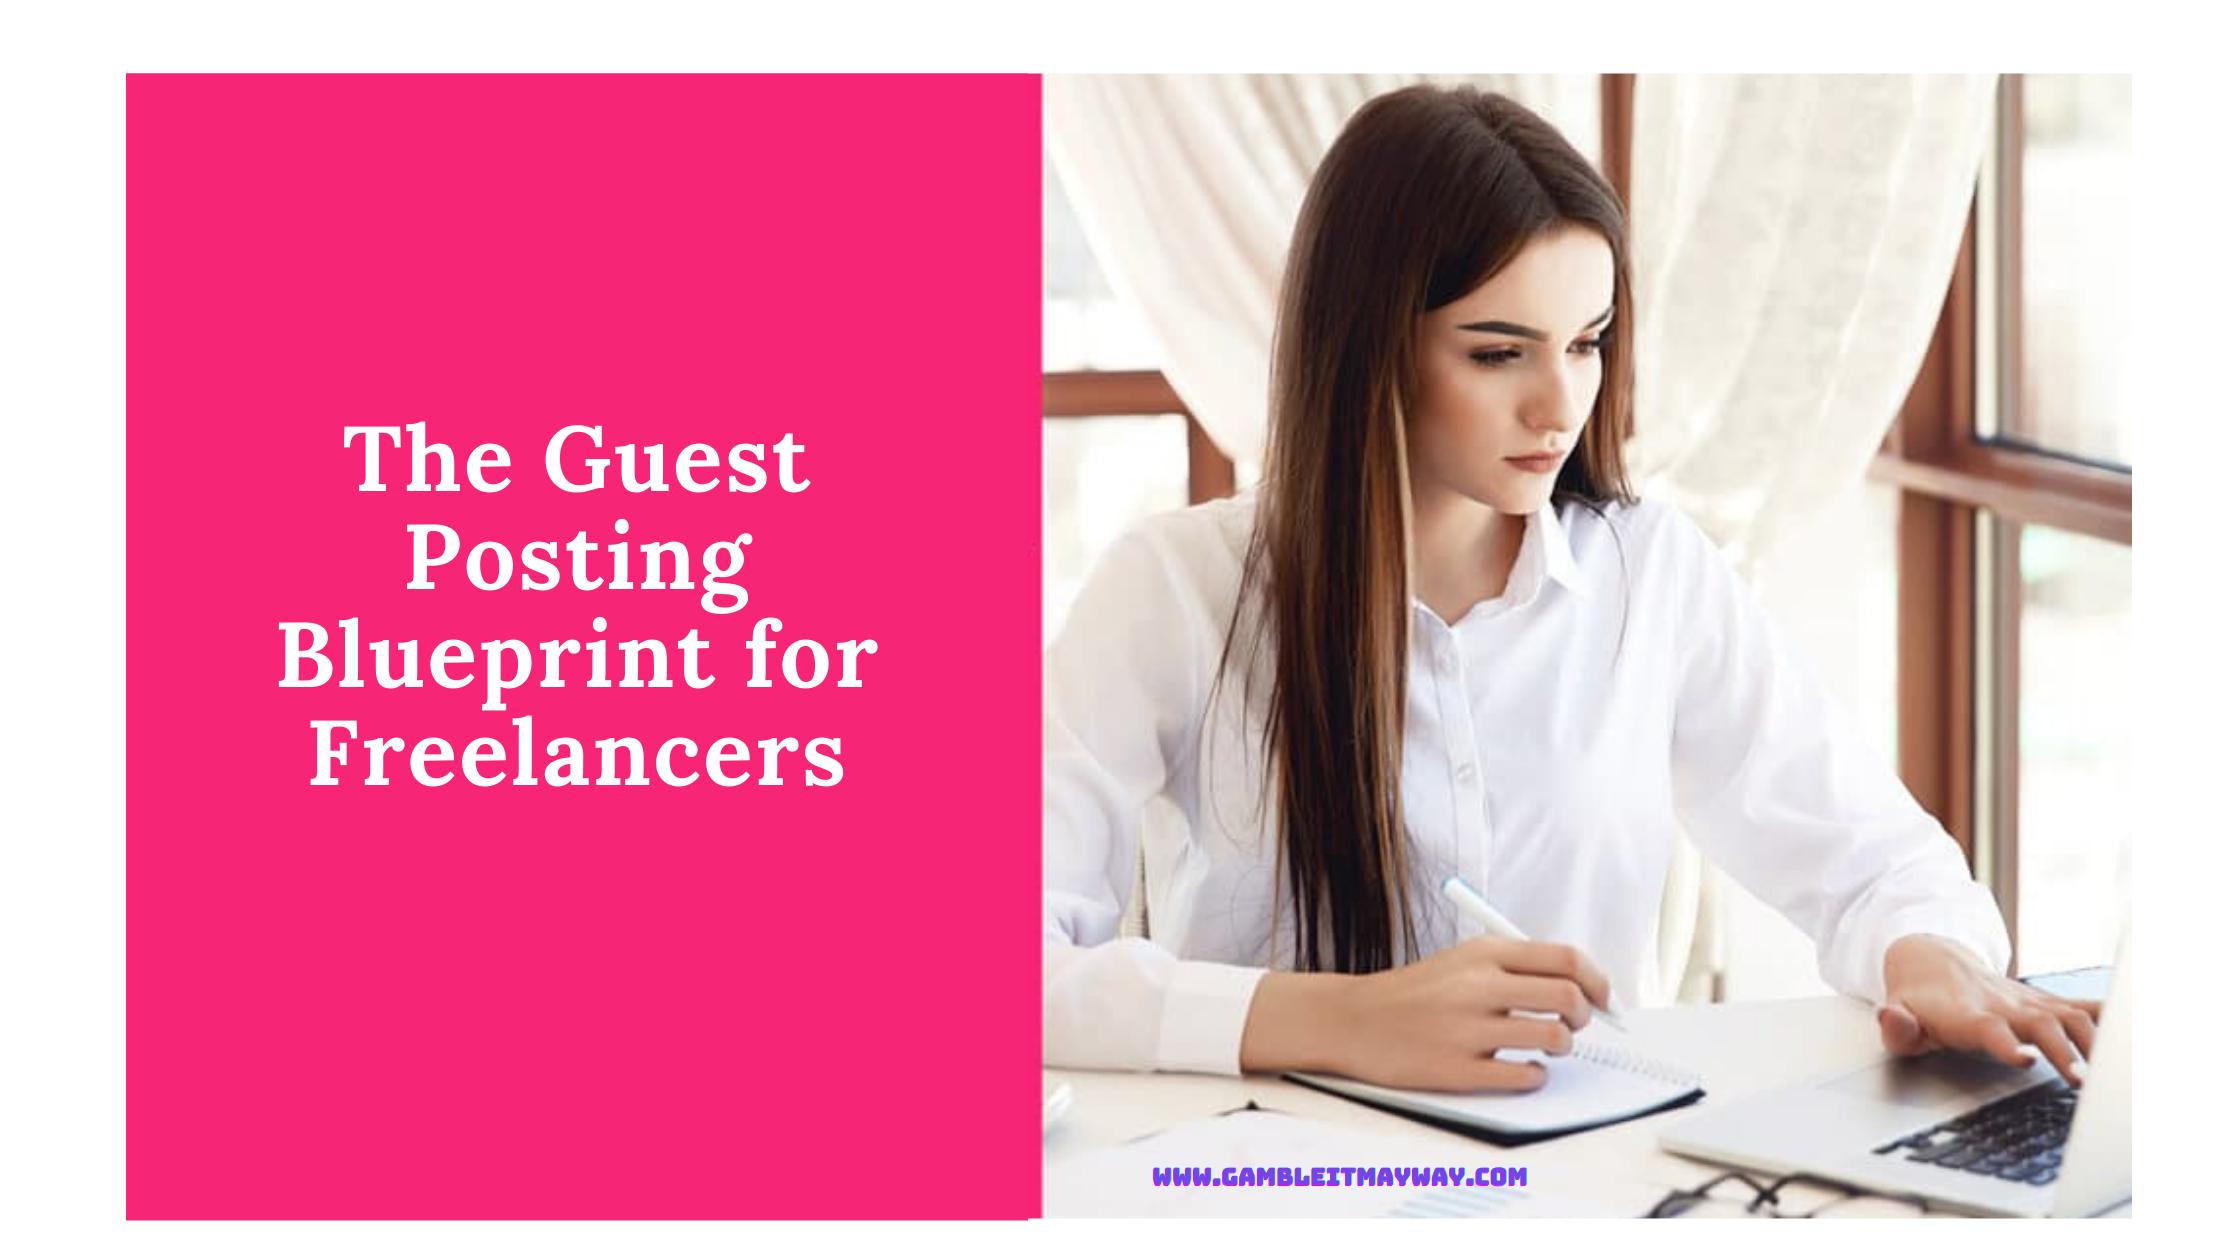 The Guest Posting Blueprint for Freelancers